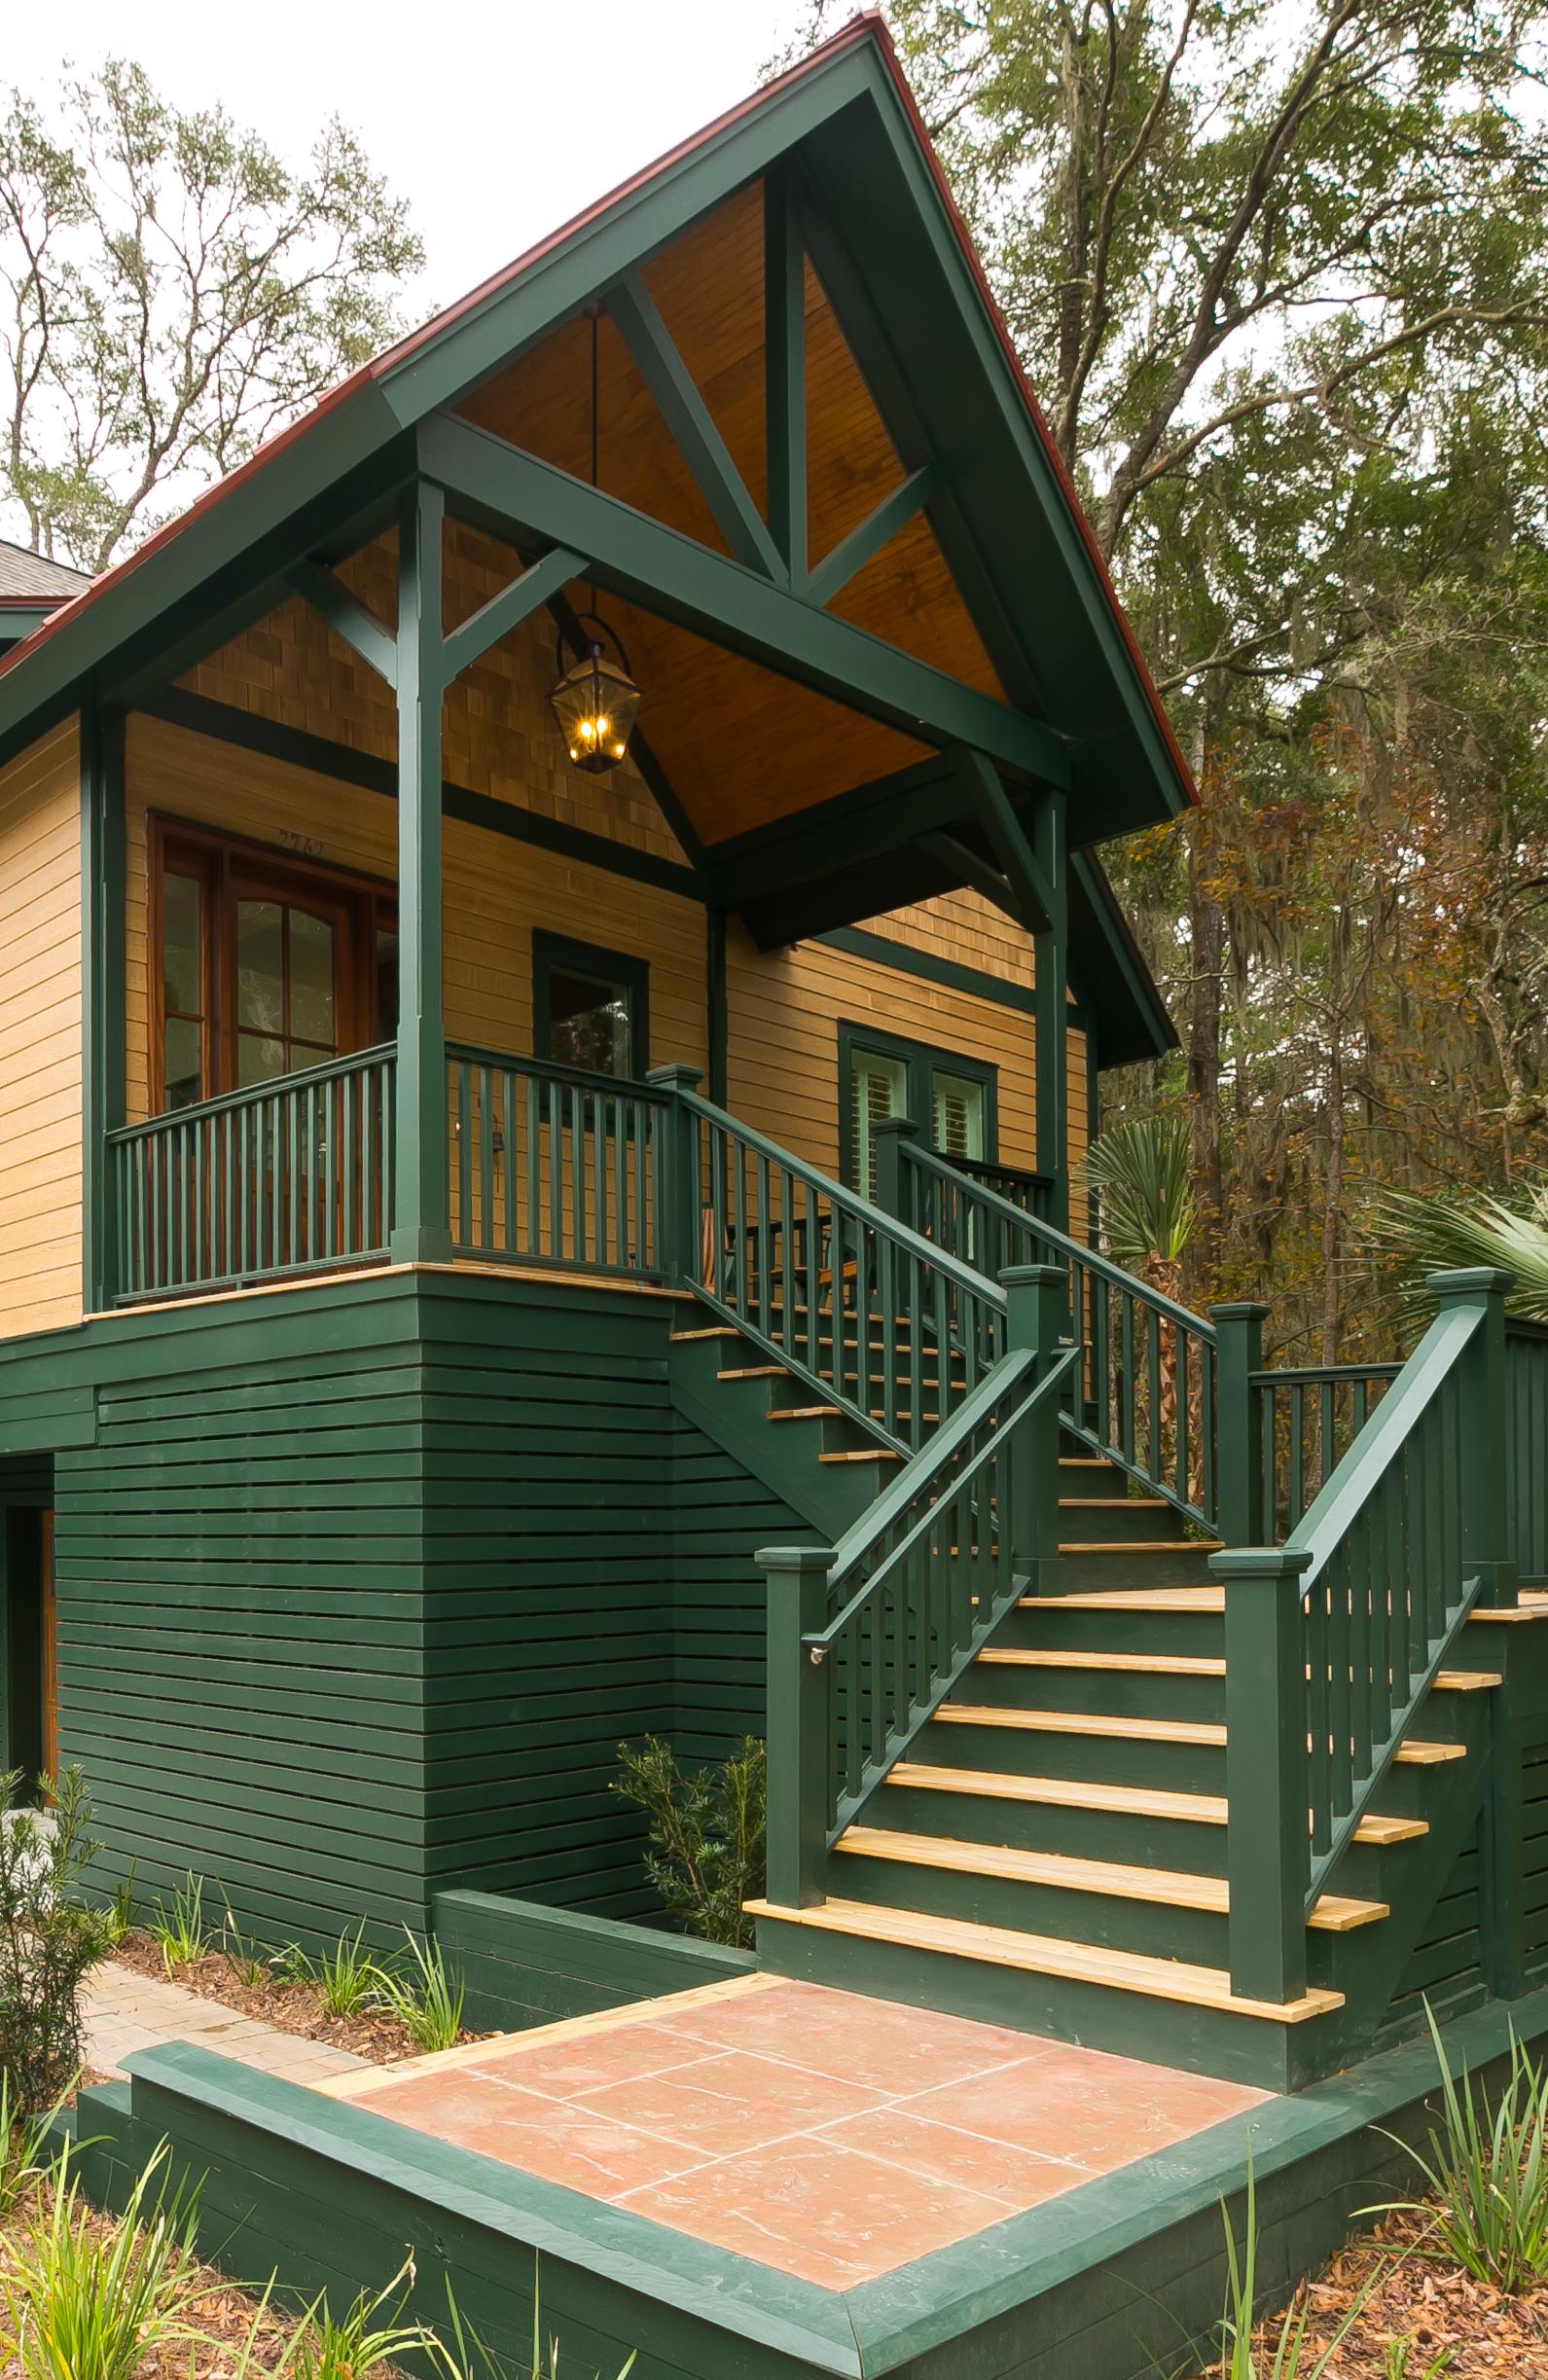 Architecture Plus - 2762 Old Forest Drive Seabrook - PhotosByPatrickBrickman_04.jpg